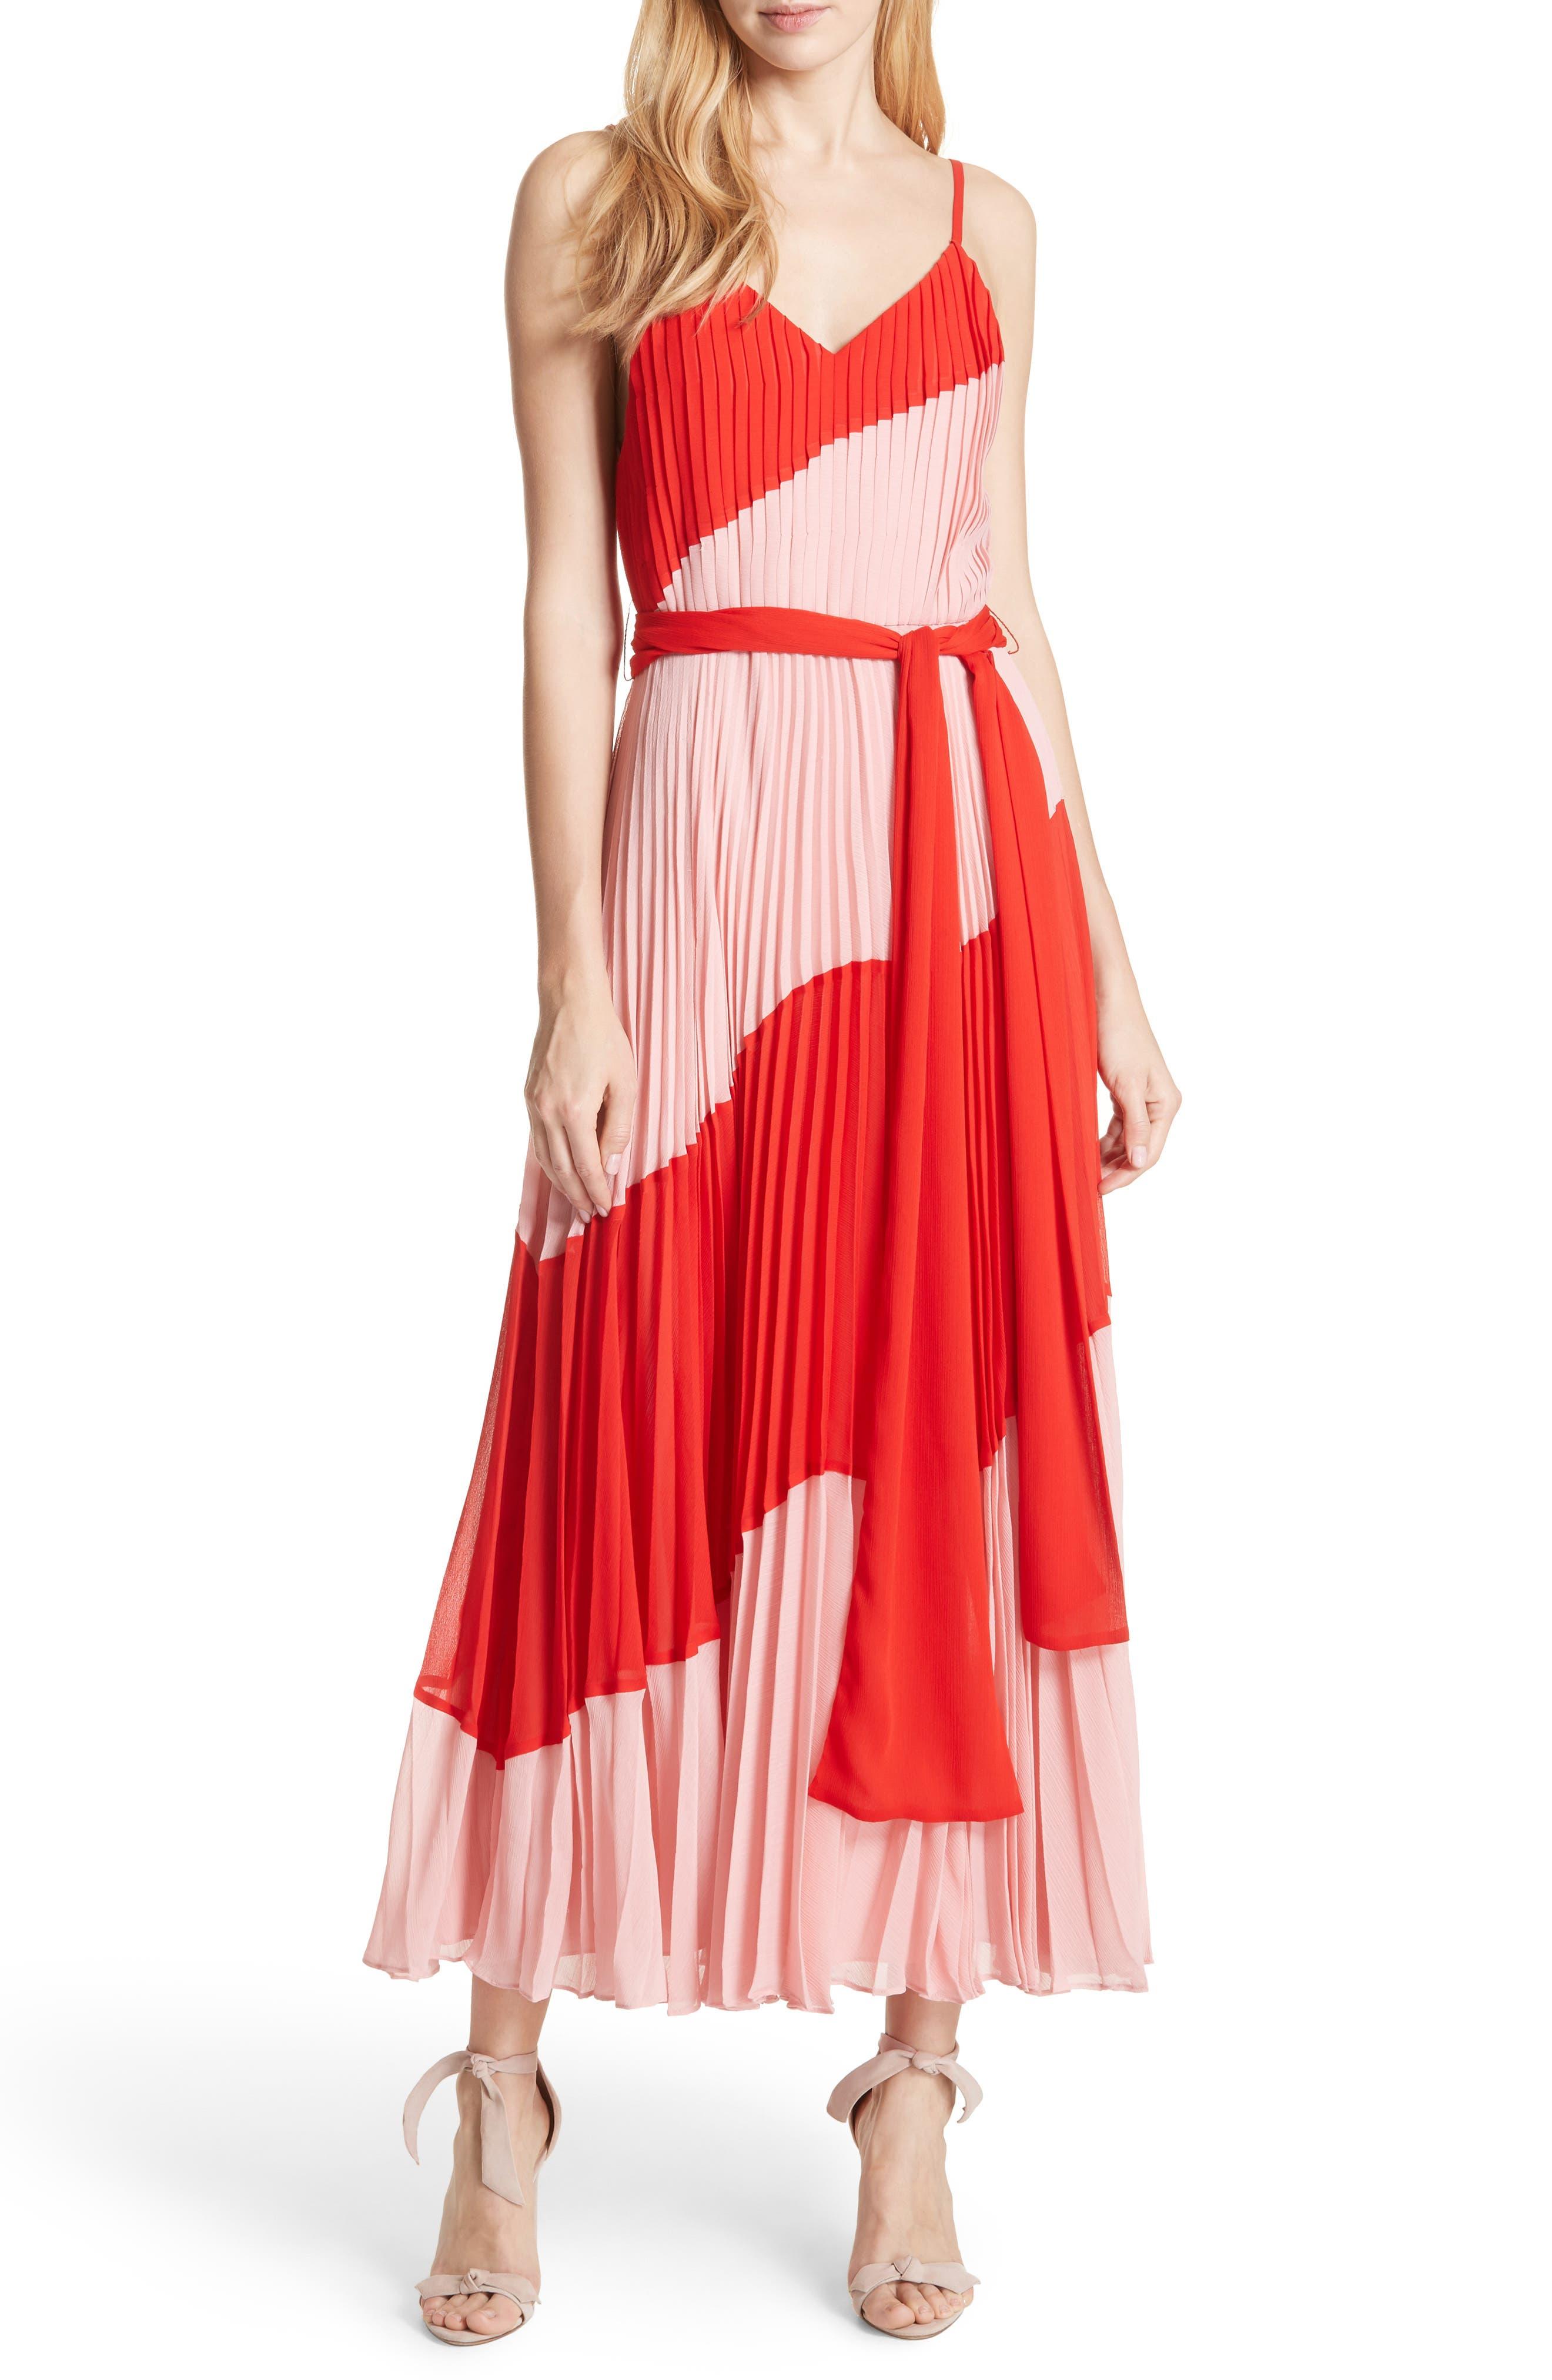 Rozlyn Pleat Colorblock Maxi Dress,                             Main thumbnail 1, color,                             Perfect Poppy/ Blossom